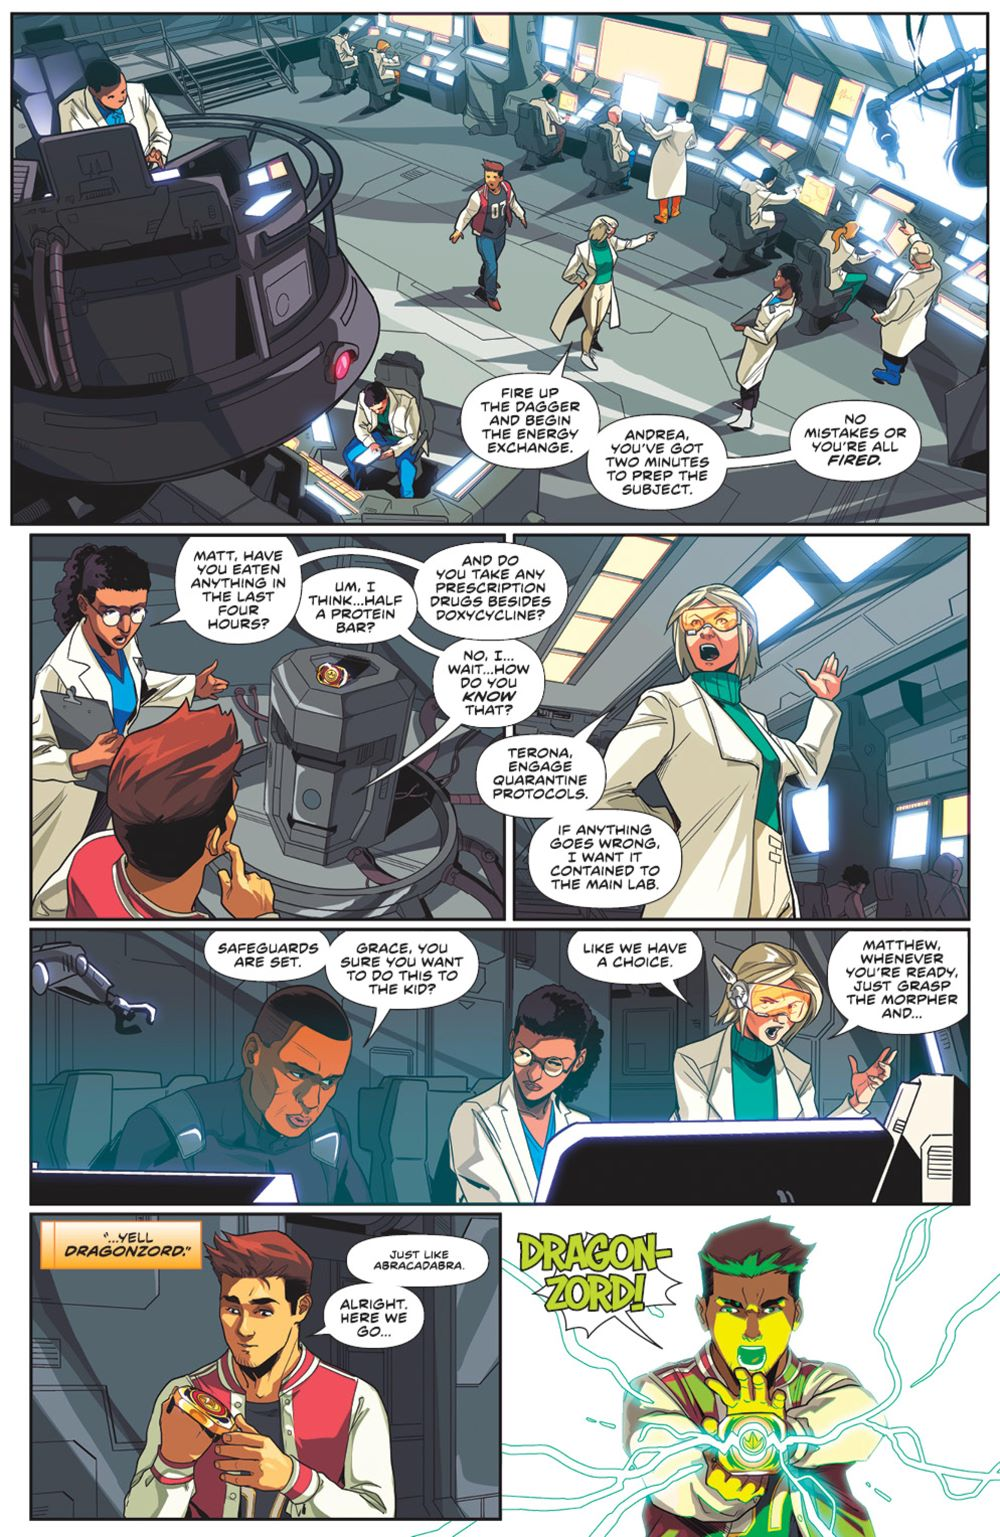 MightyMorphin_005_PRESS_5 ComicList Previews: MIGHTY MORPHIN #5